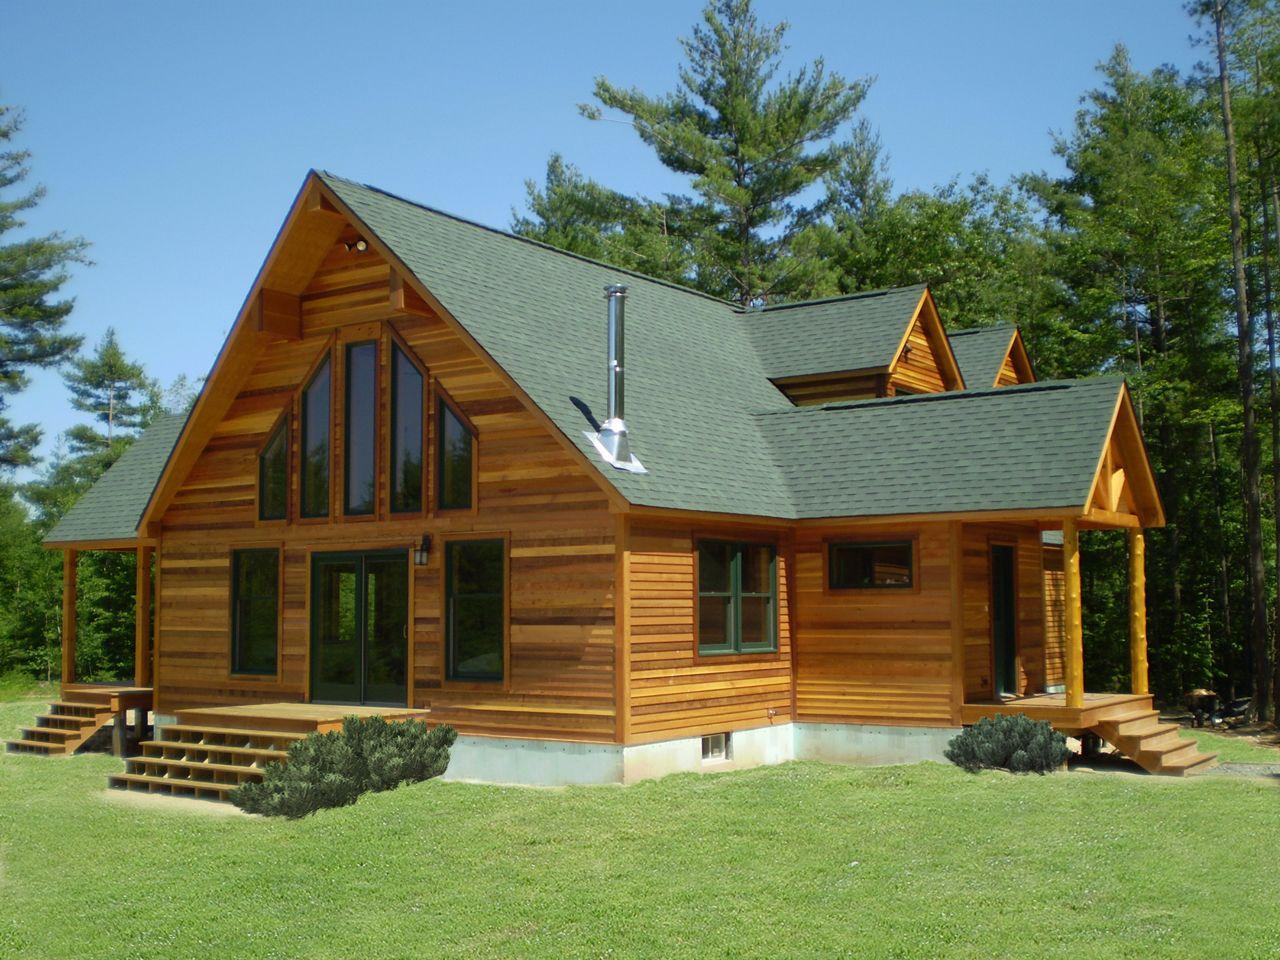 modern style modular home kentucky Google Search